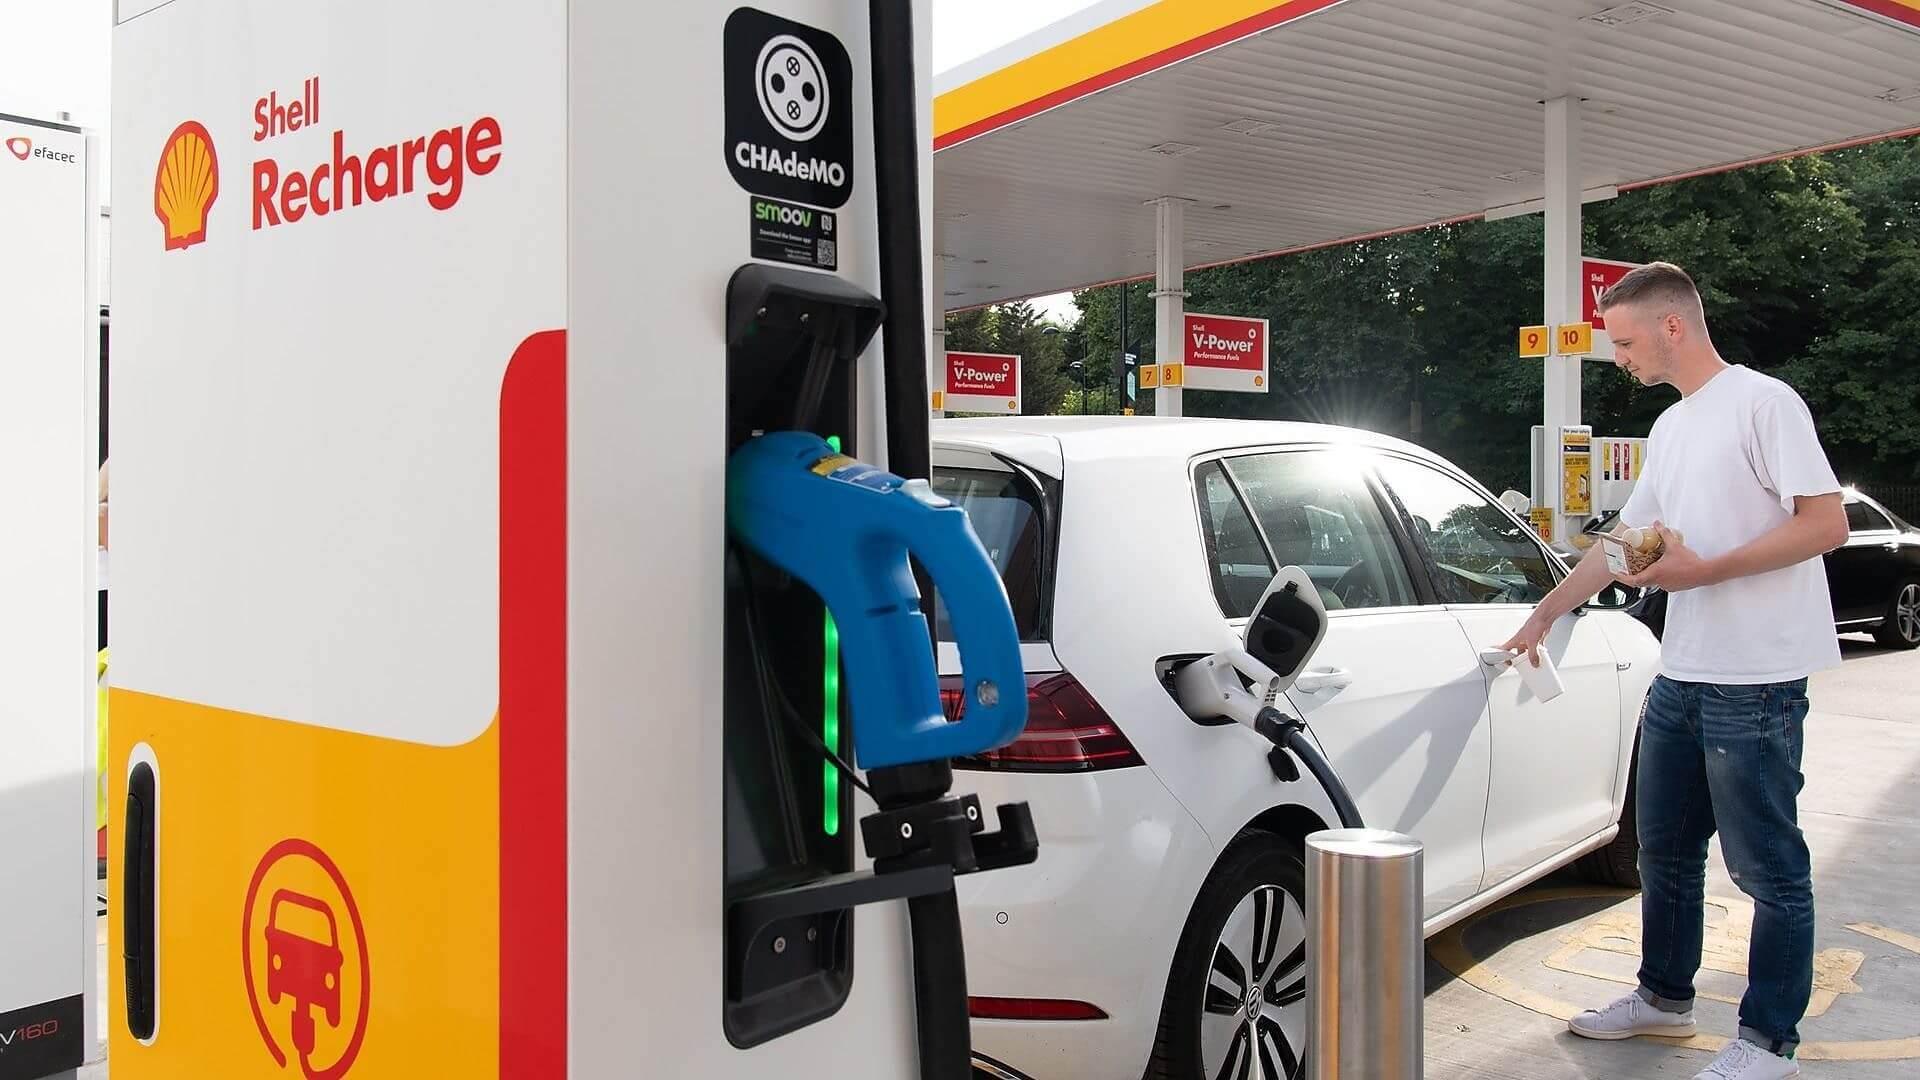 Быстрая зарядная станция для электромобилей от Shell